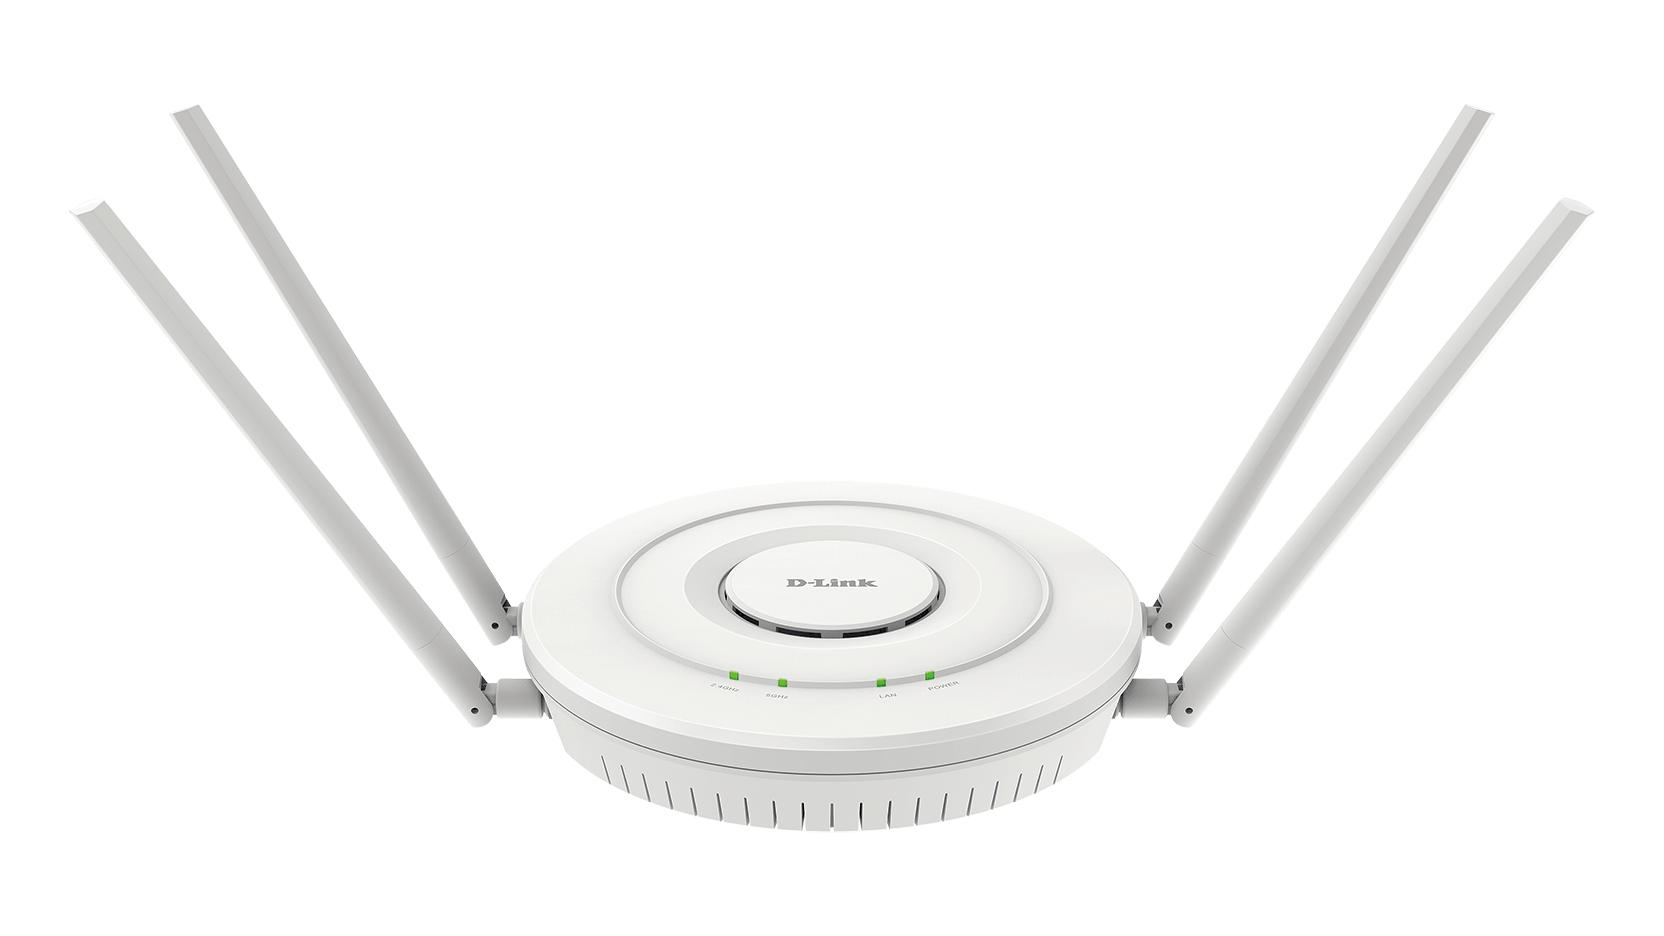 D-Link DWL-6610APE punto de acceso WLAN 1200 Mbit/s Energía sobre Ethernet (PoE) Blanco